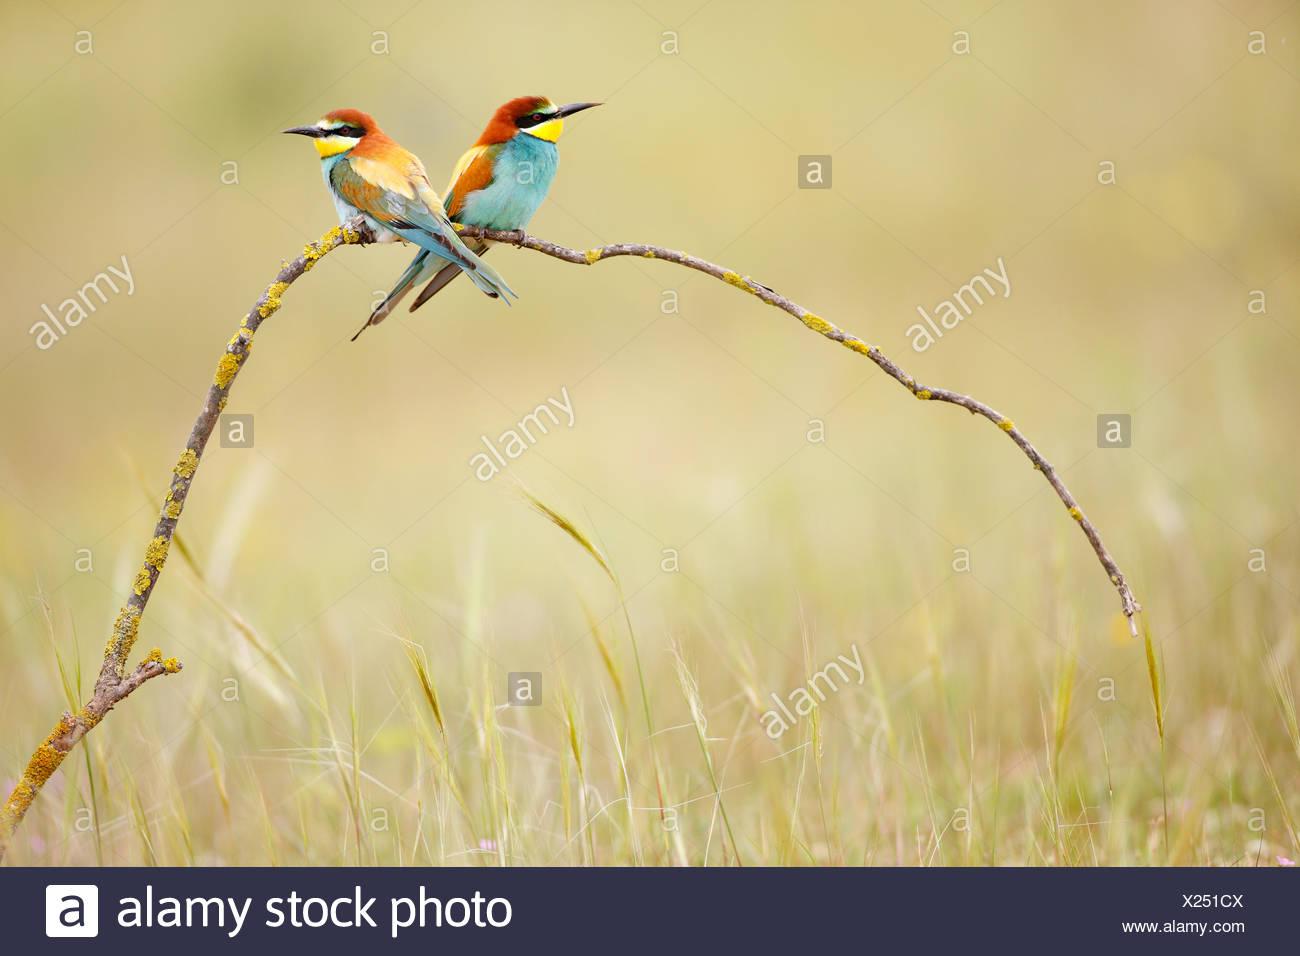 Abeja europea eaters (Merops apiaster) en la rama en la pradera. Sevilla, España Imagen De Stock